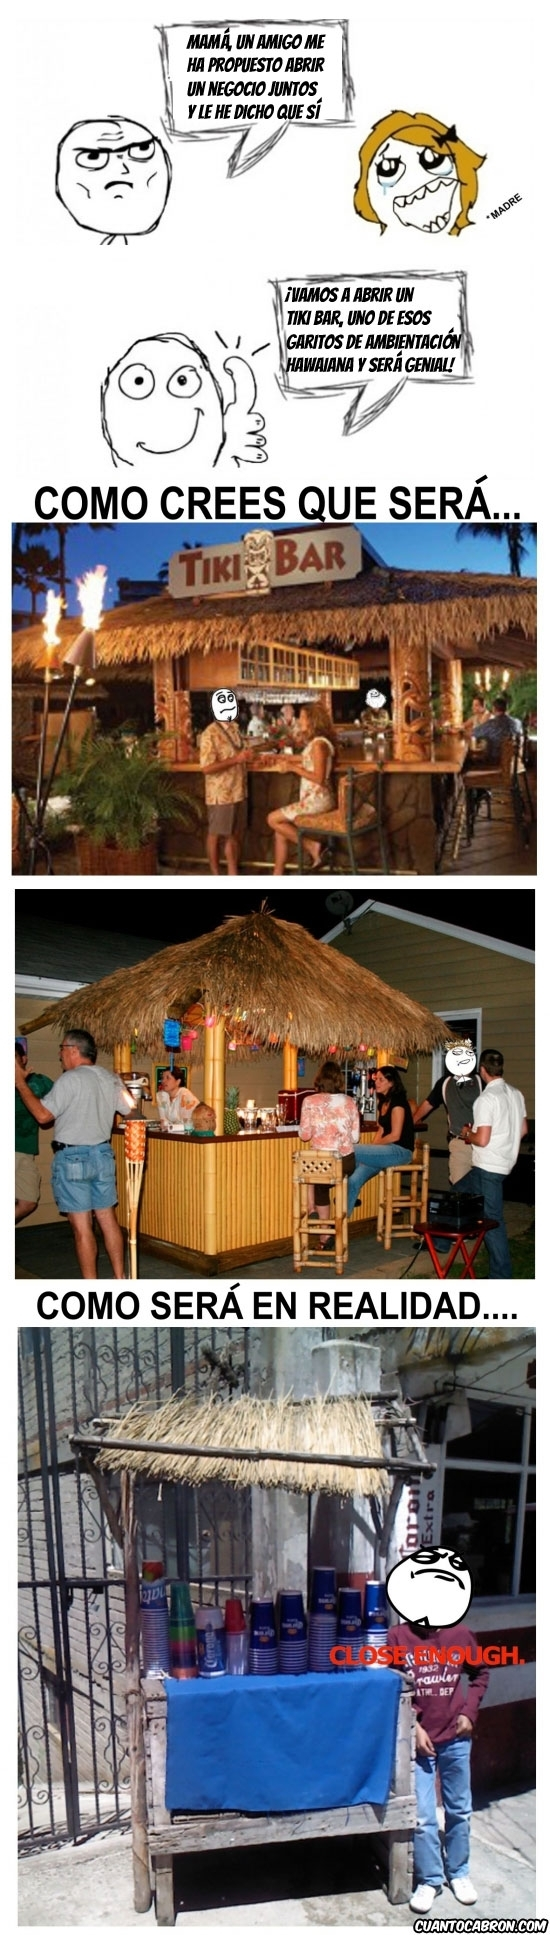 Fuck_yea - ¡Montemos un Tiki Bar!